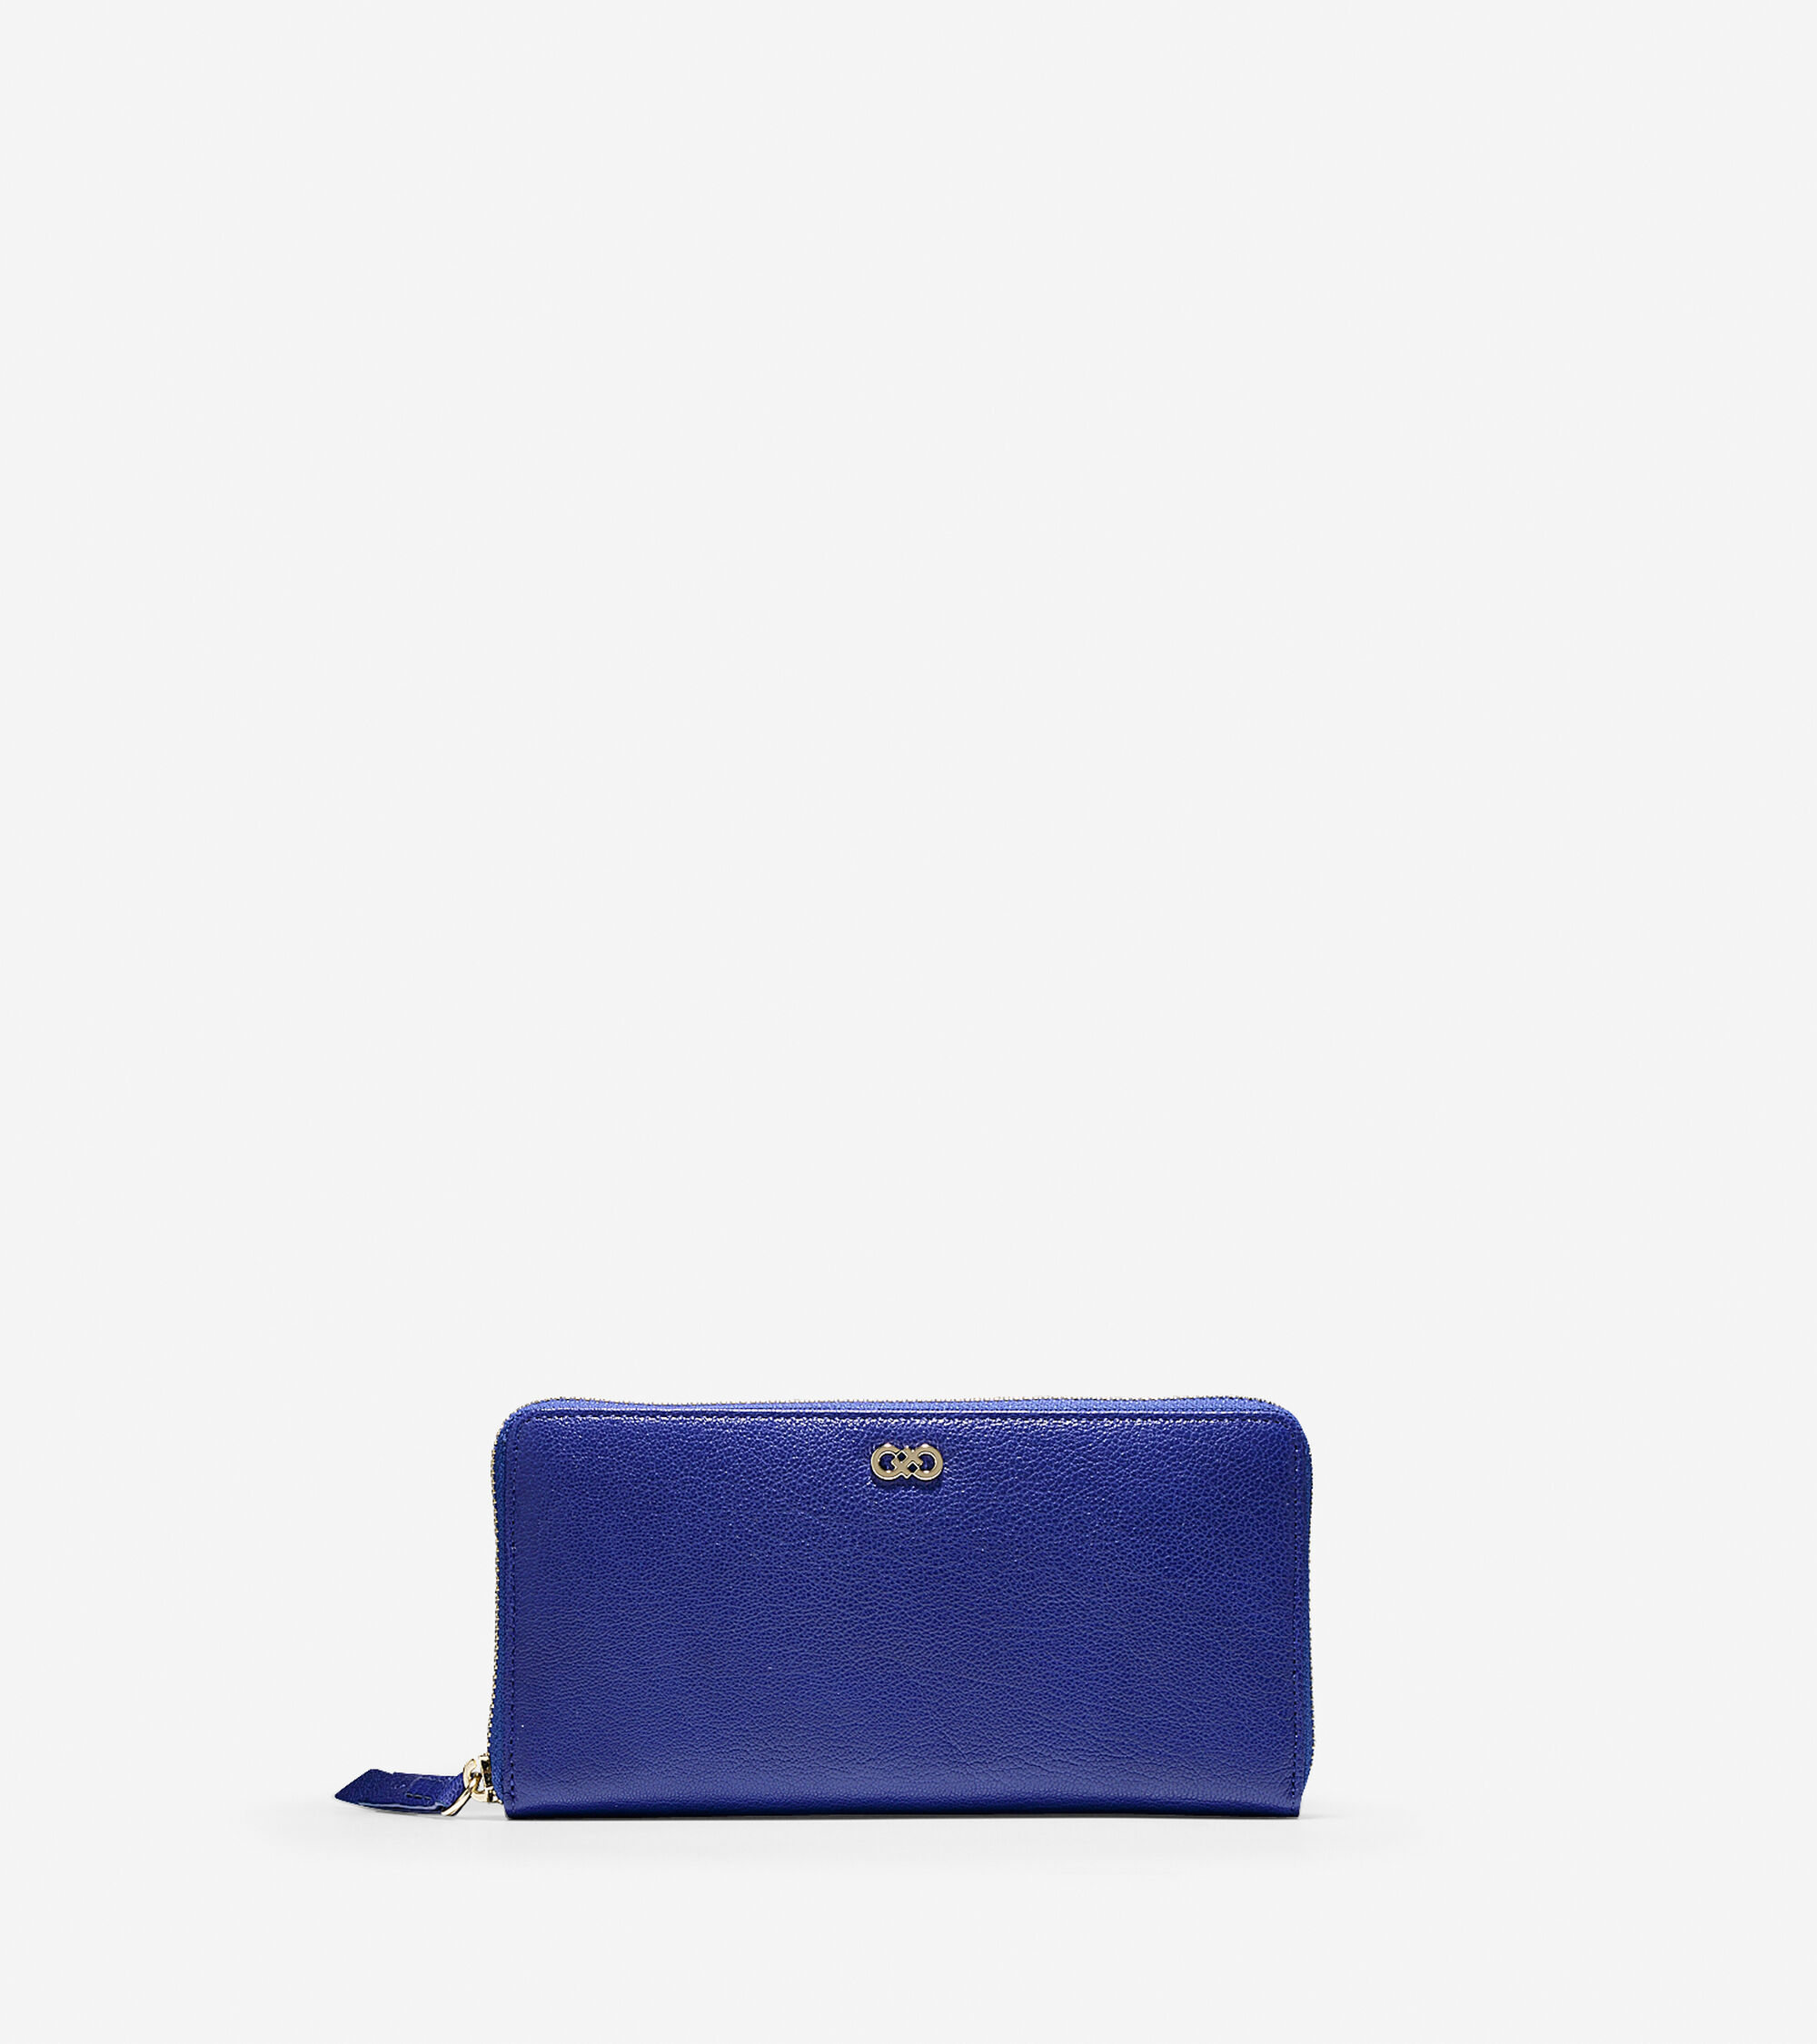 Accessories > Reddington Continental Zip Wallet